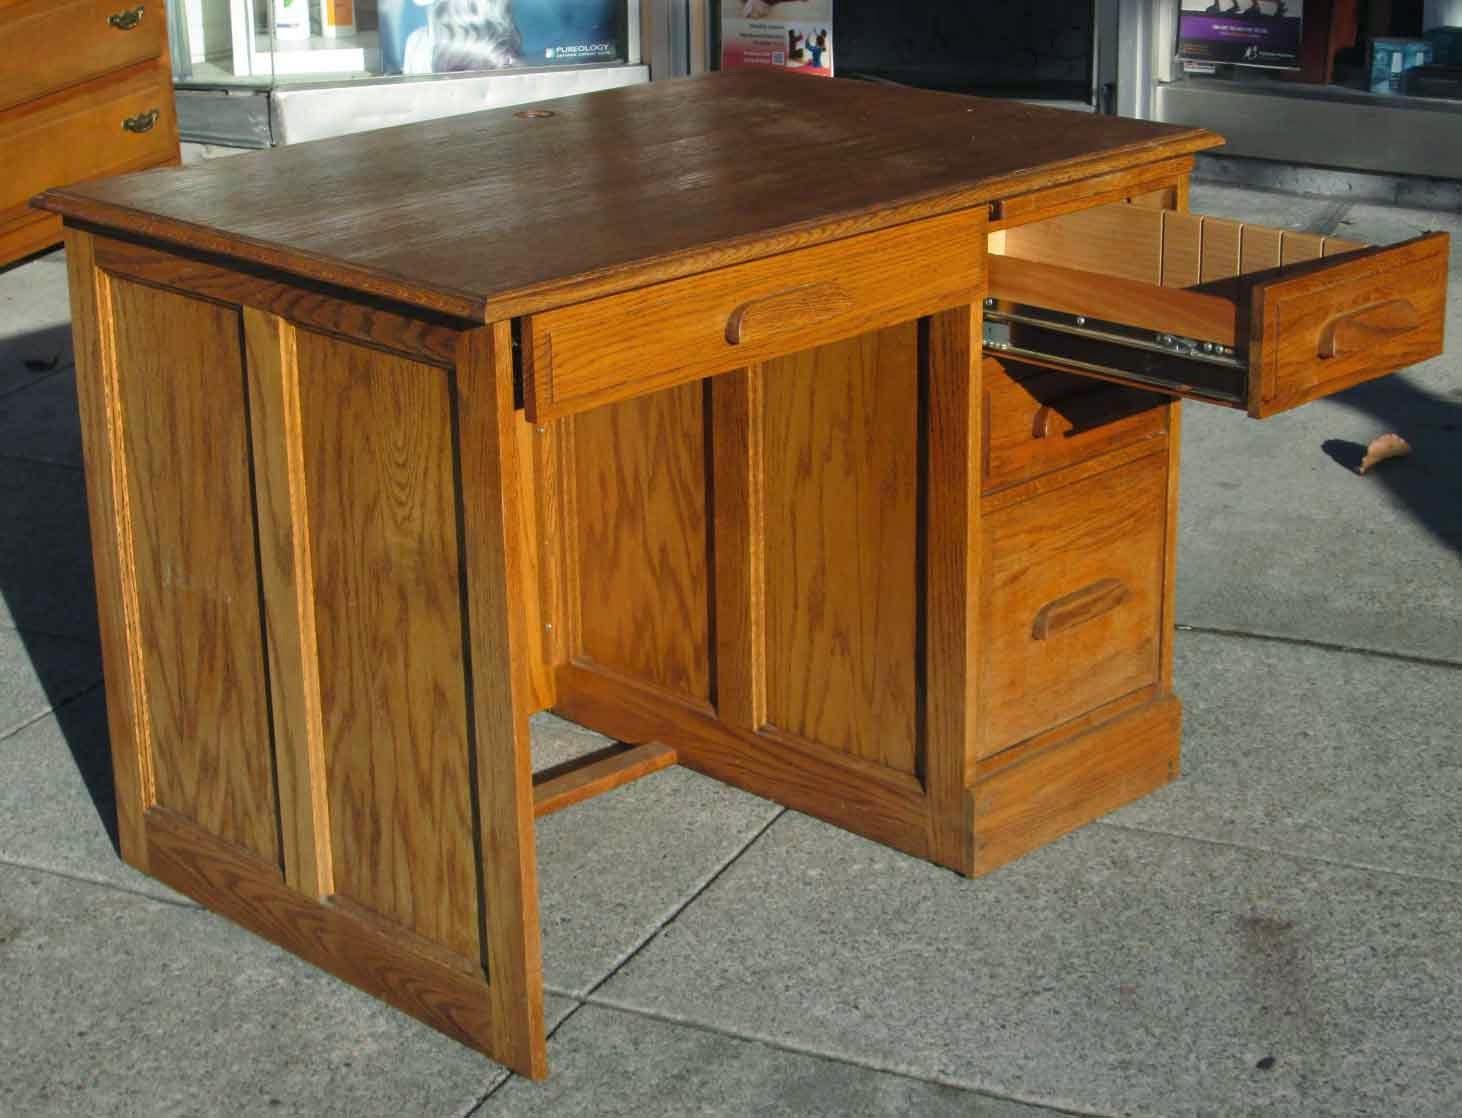 UHURU FURNITURE & COLLECTIBLES SOLD Golden Oak Desk $75